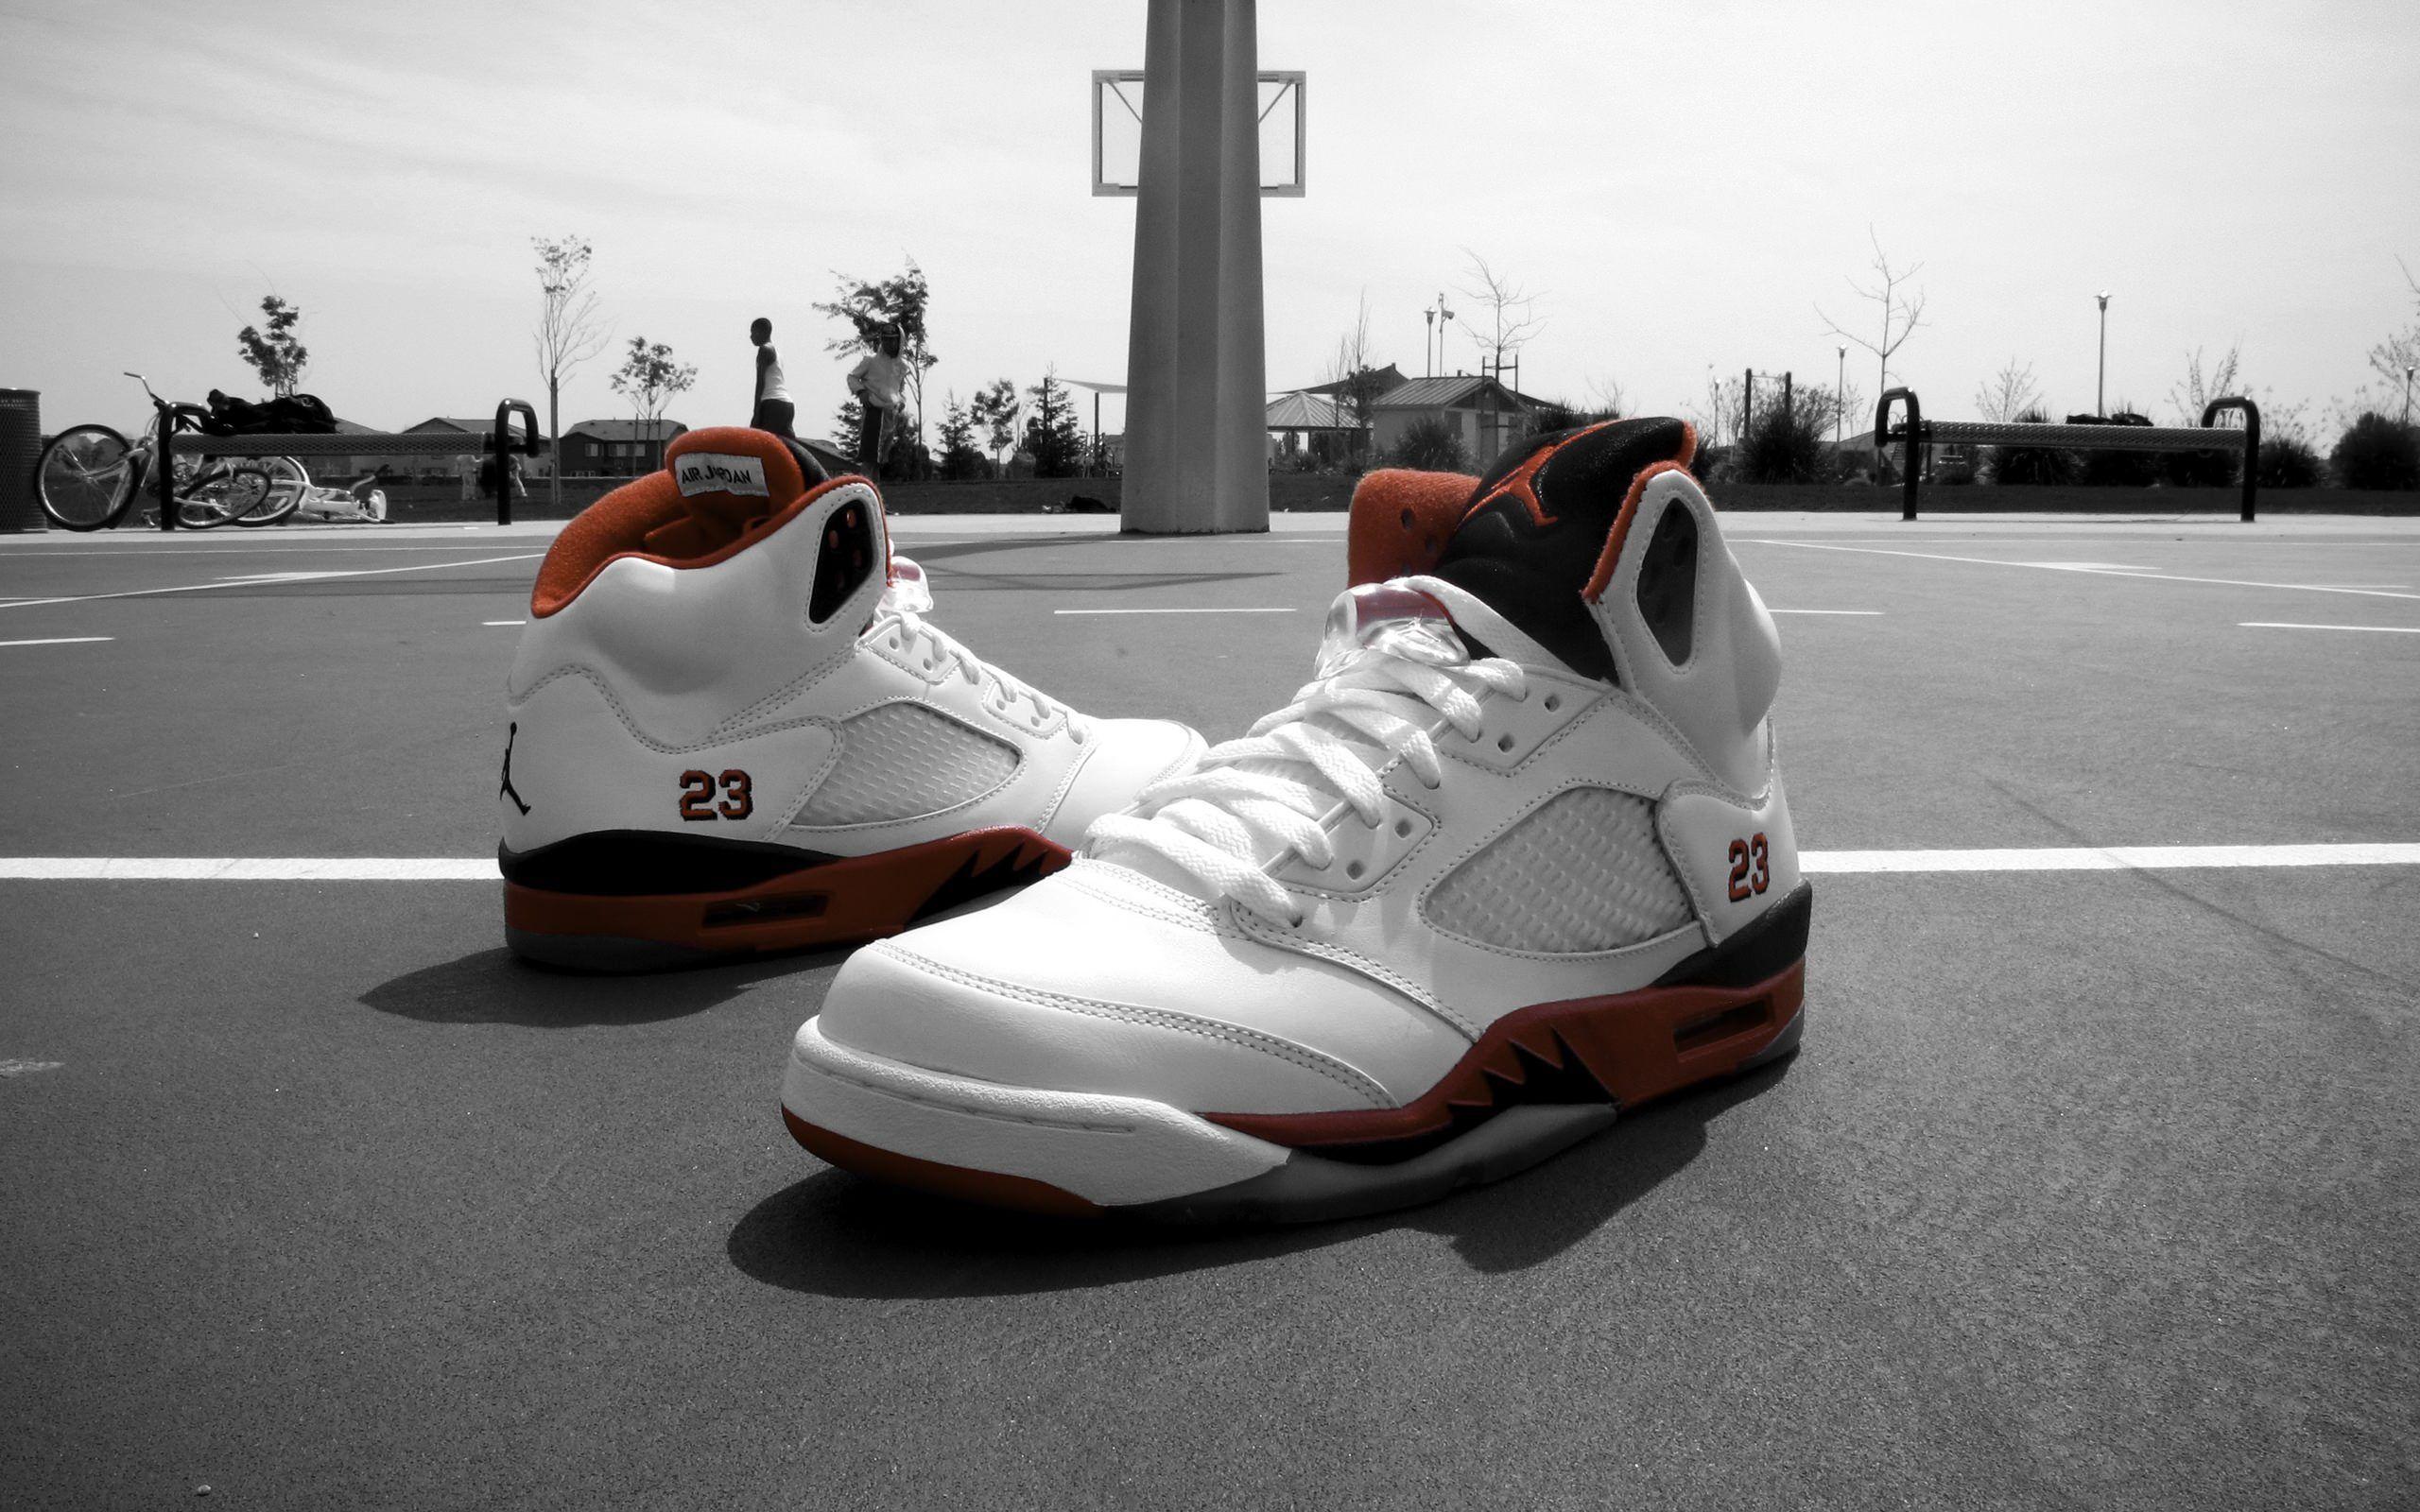 Nike Air Jordan Fondos De Alta Definición A0I2ek